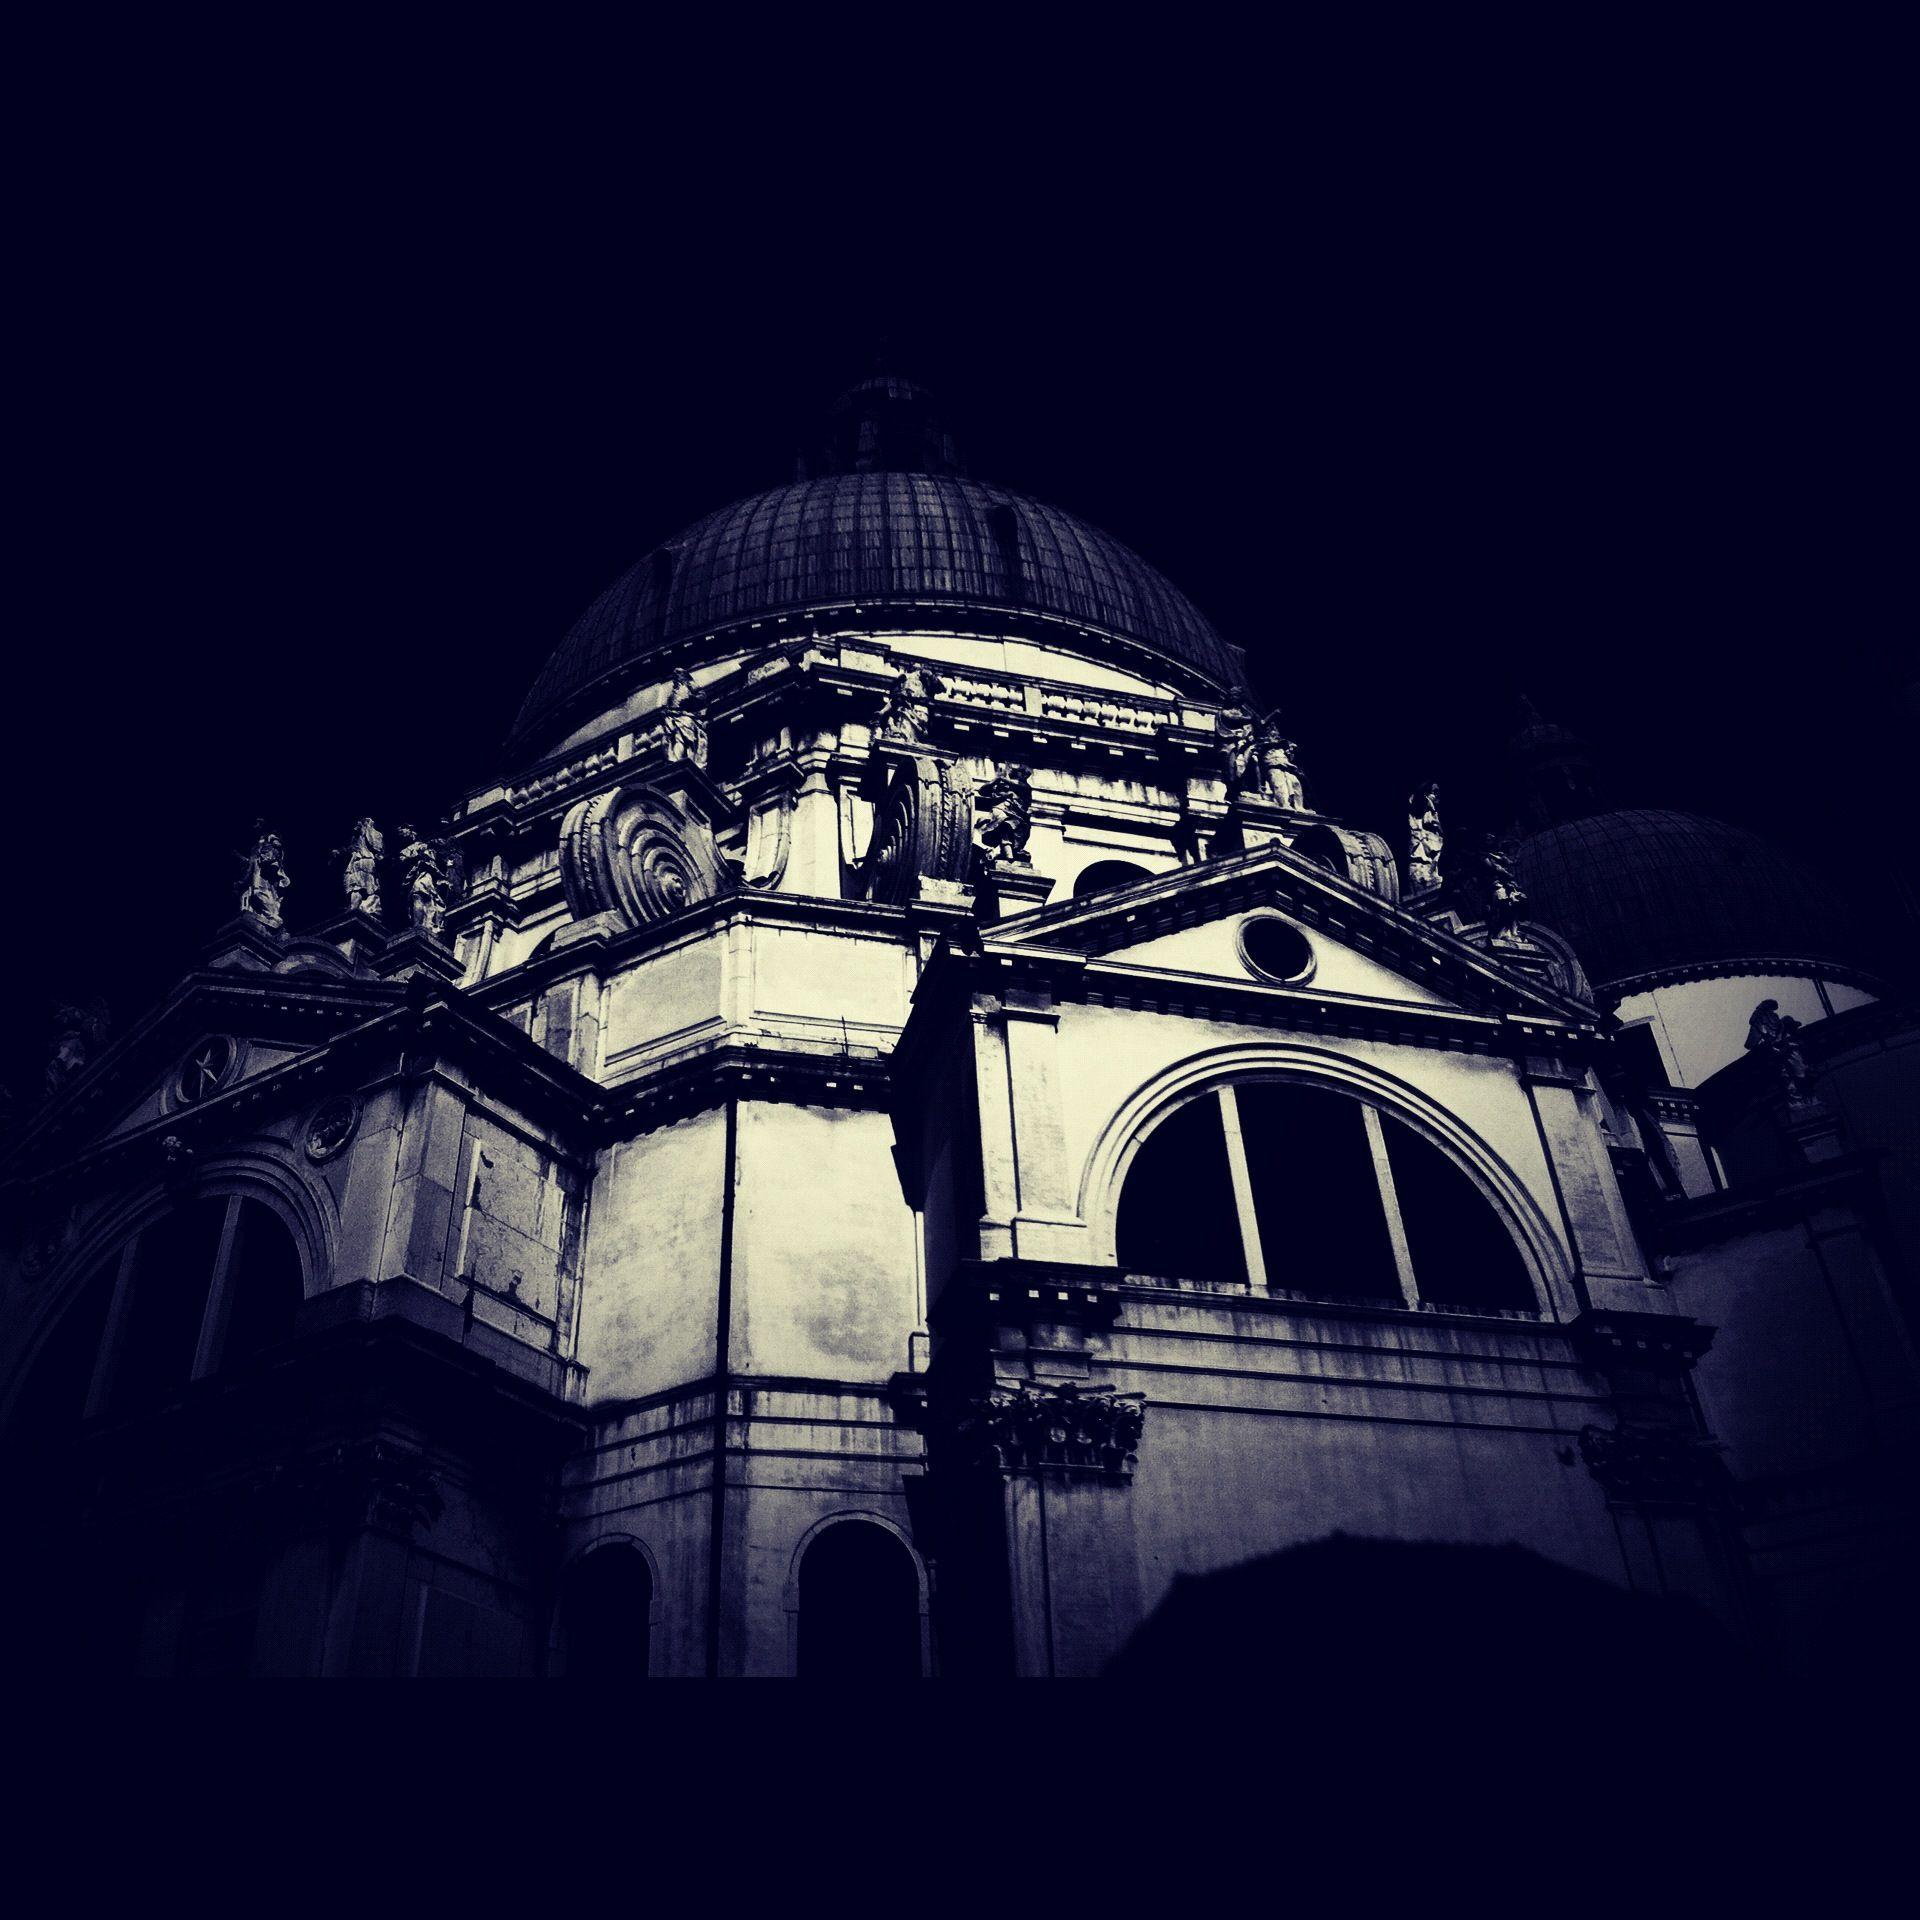 Atemporary Pic #Venezia #Basilica #Salute